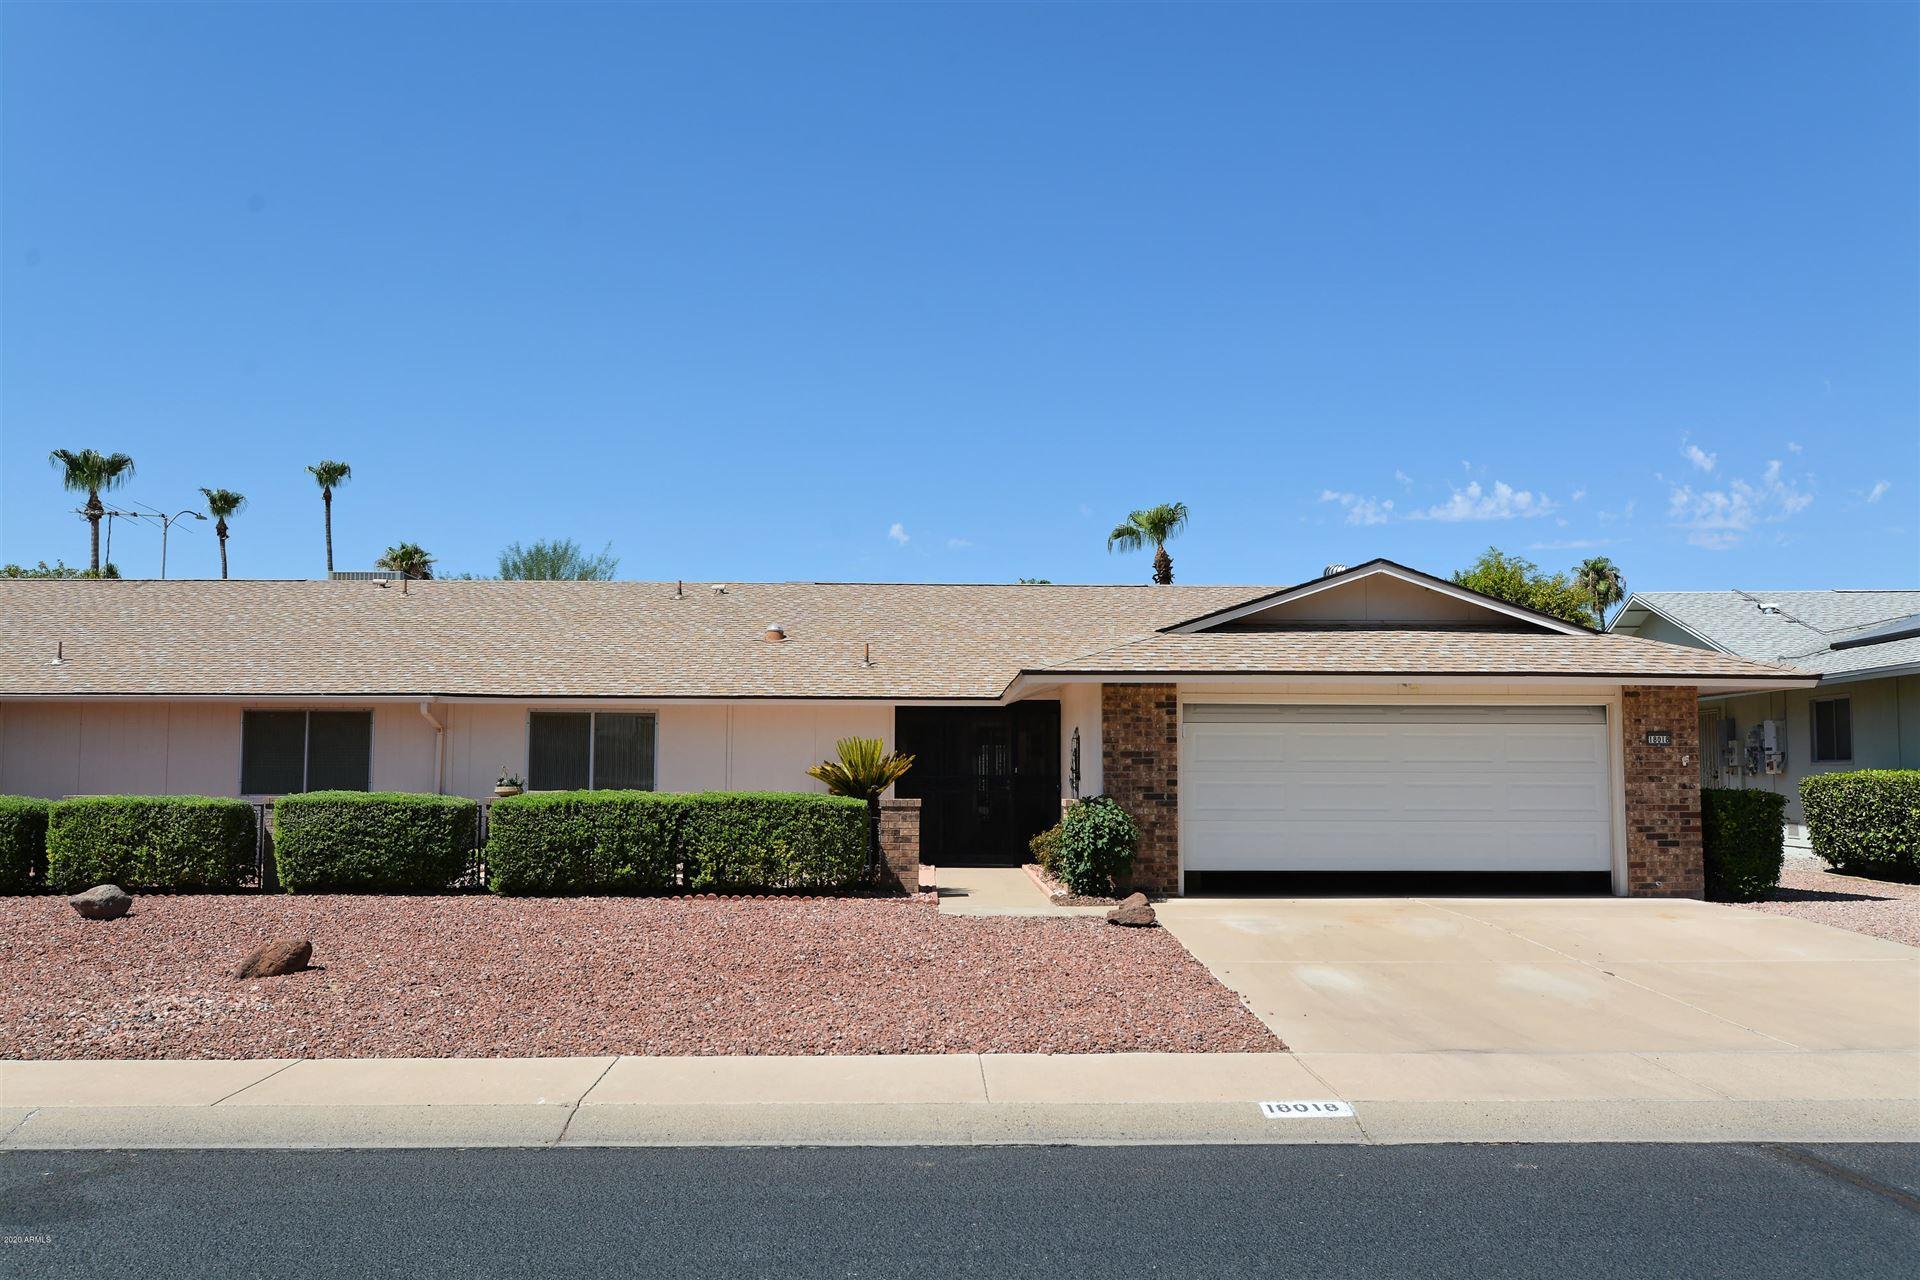 18018 N DESERT GLEN Drive, Sun City West, AZ 85375 - MLS#: 6115154